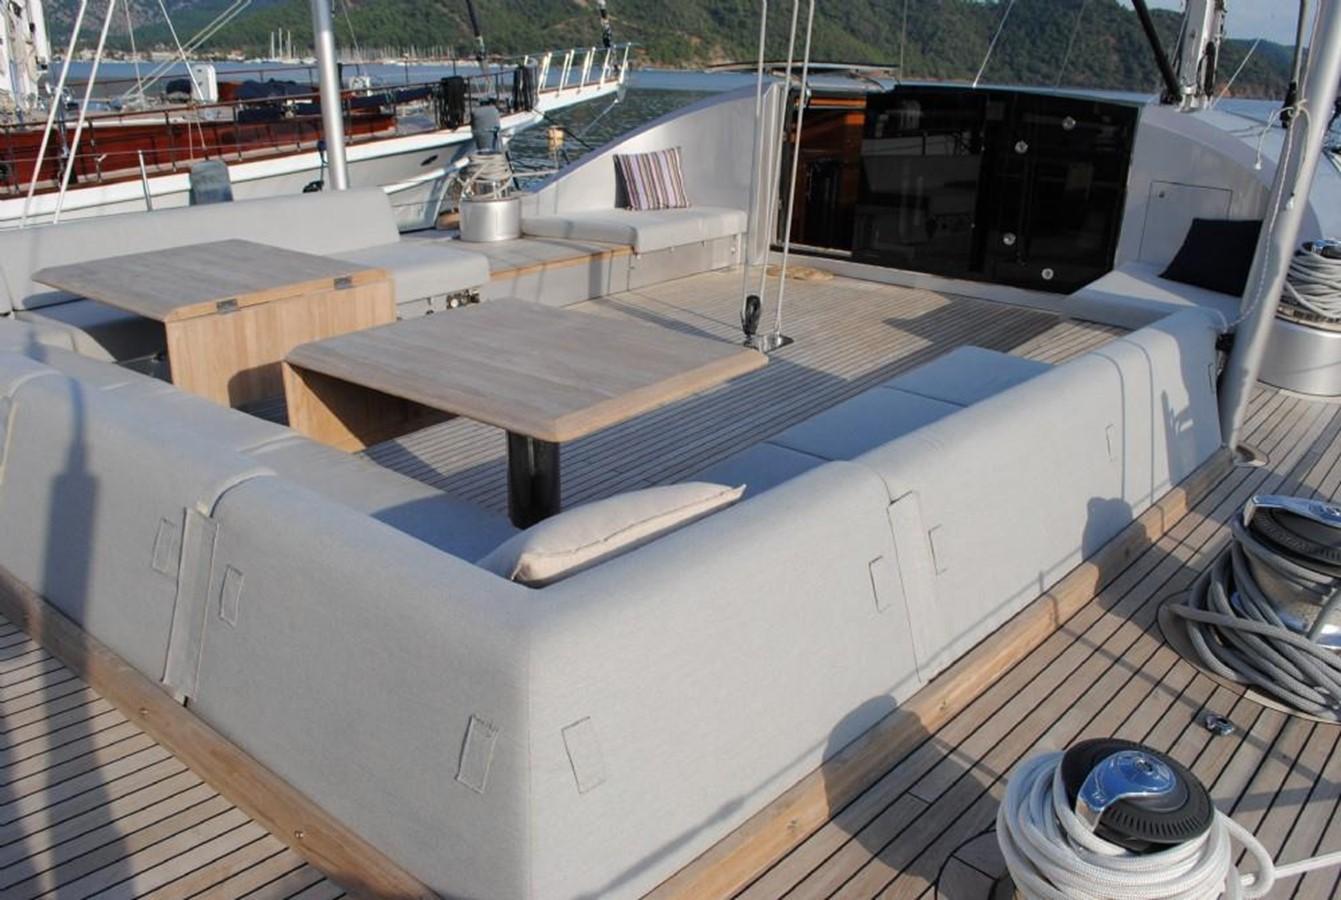 Cockpit 2012 Aydos Yatcilik  Performance Sailboat 613481